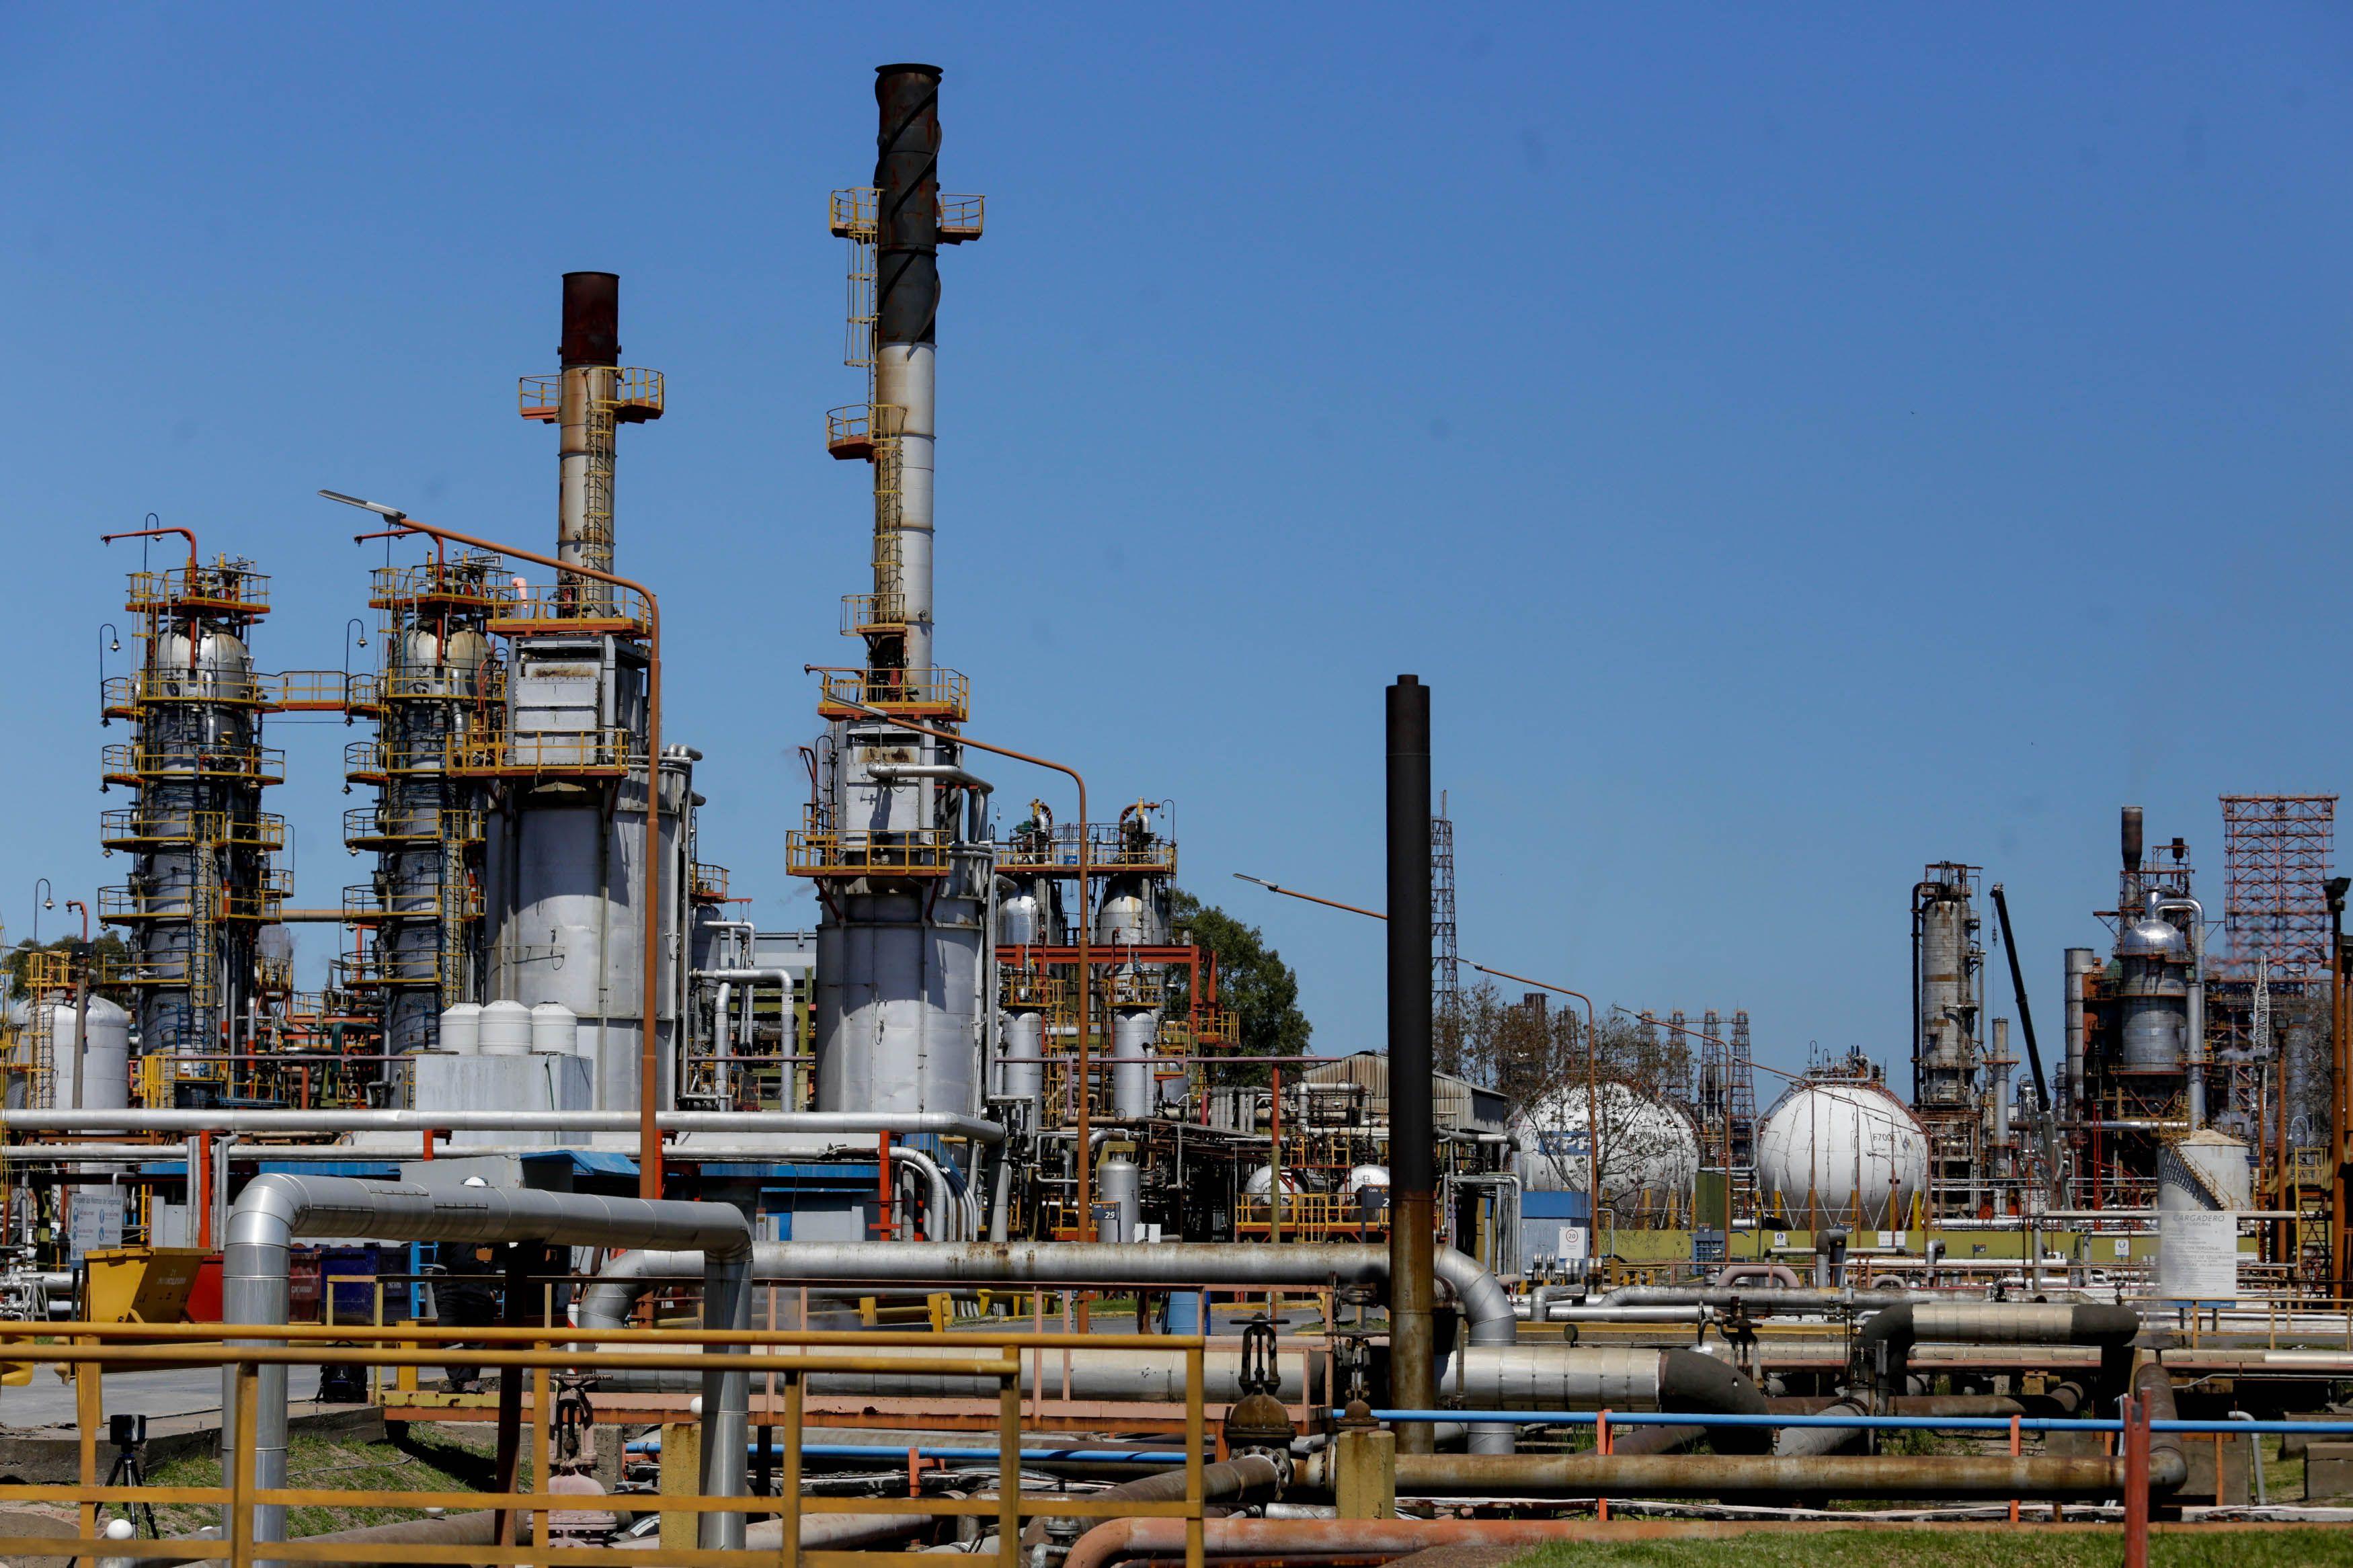 refineria la plata: el corazon de la provincia petrolera